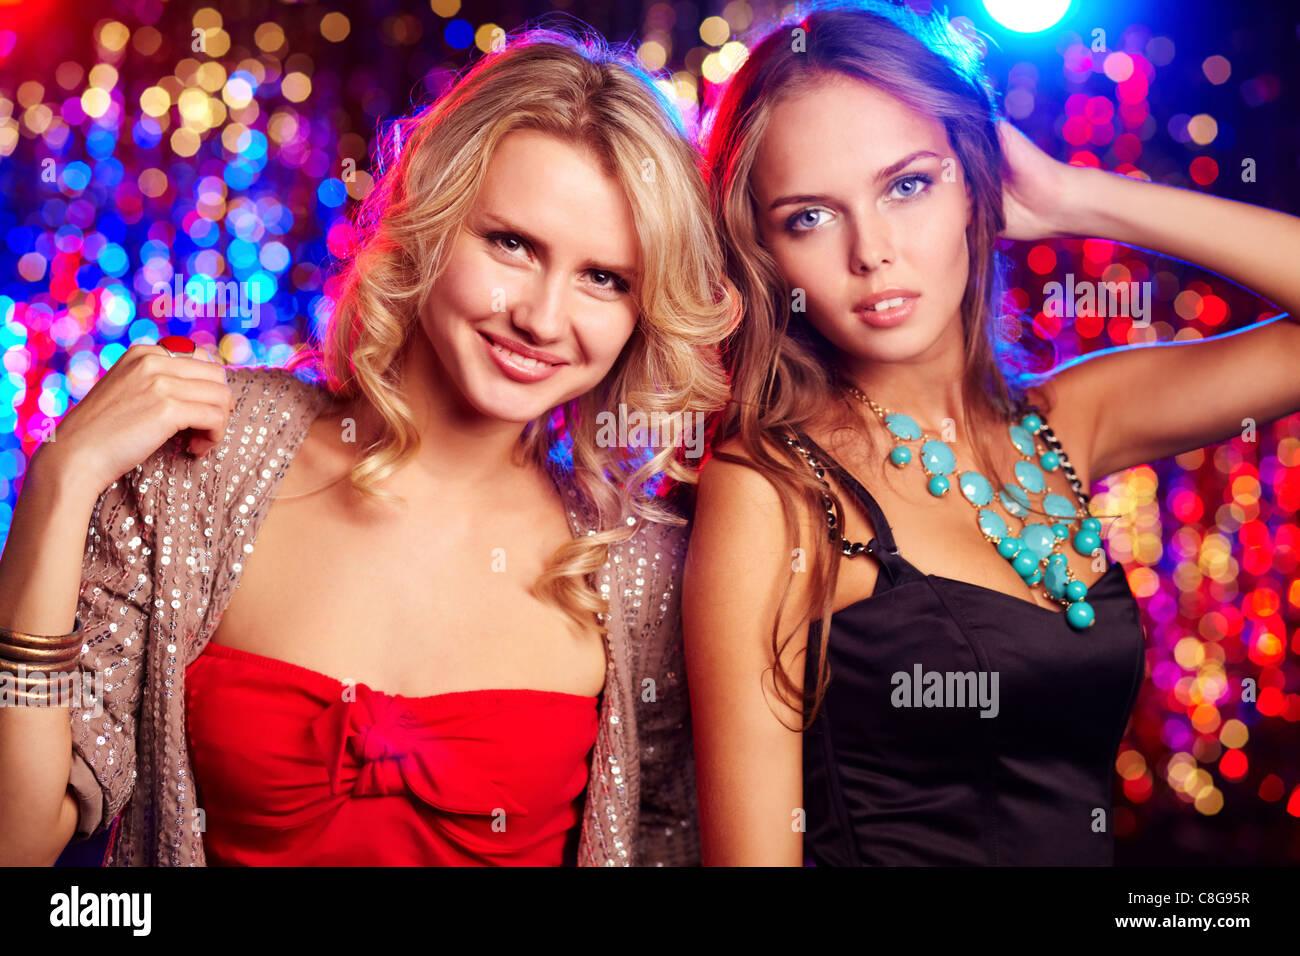 Portrait of two beautiful glamorous girls - Stock Image